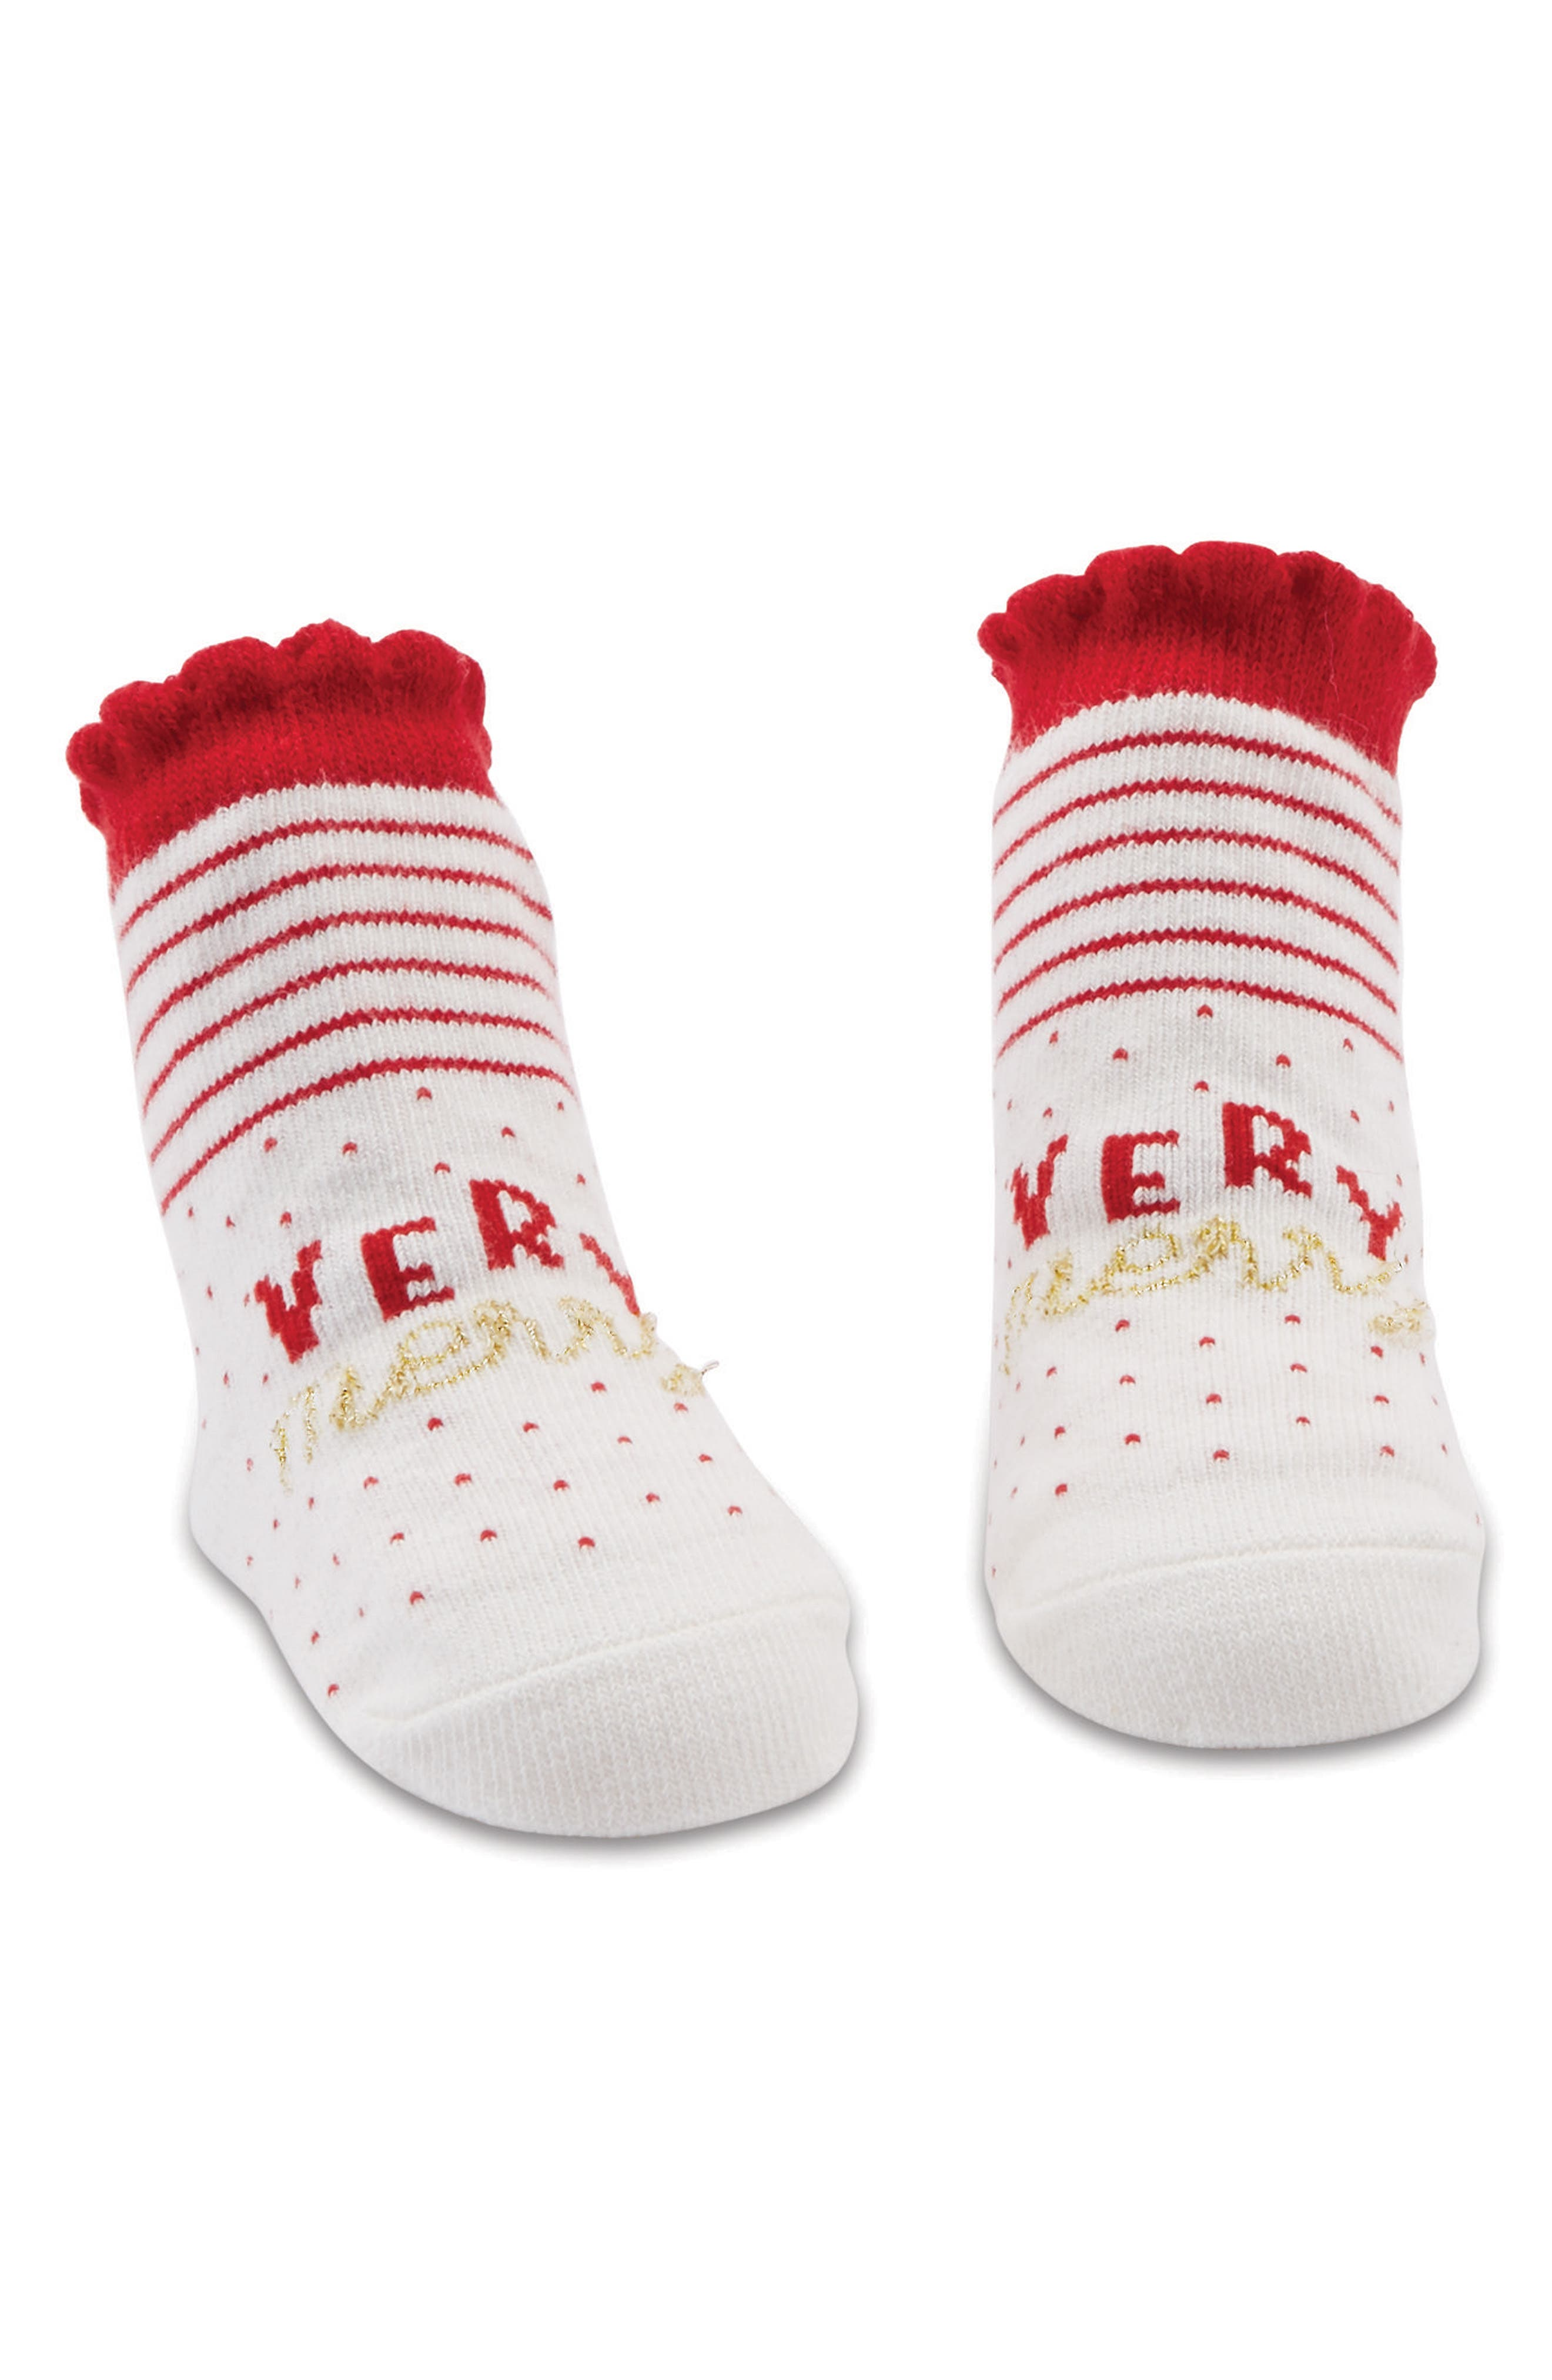 Very Merry Socks,                         Main,                         color, 600